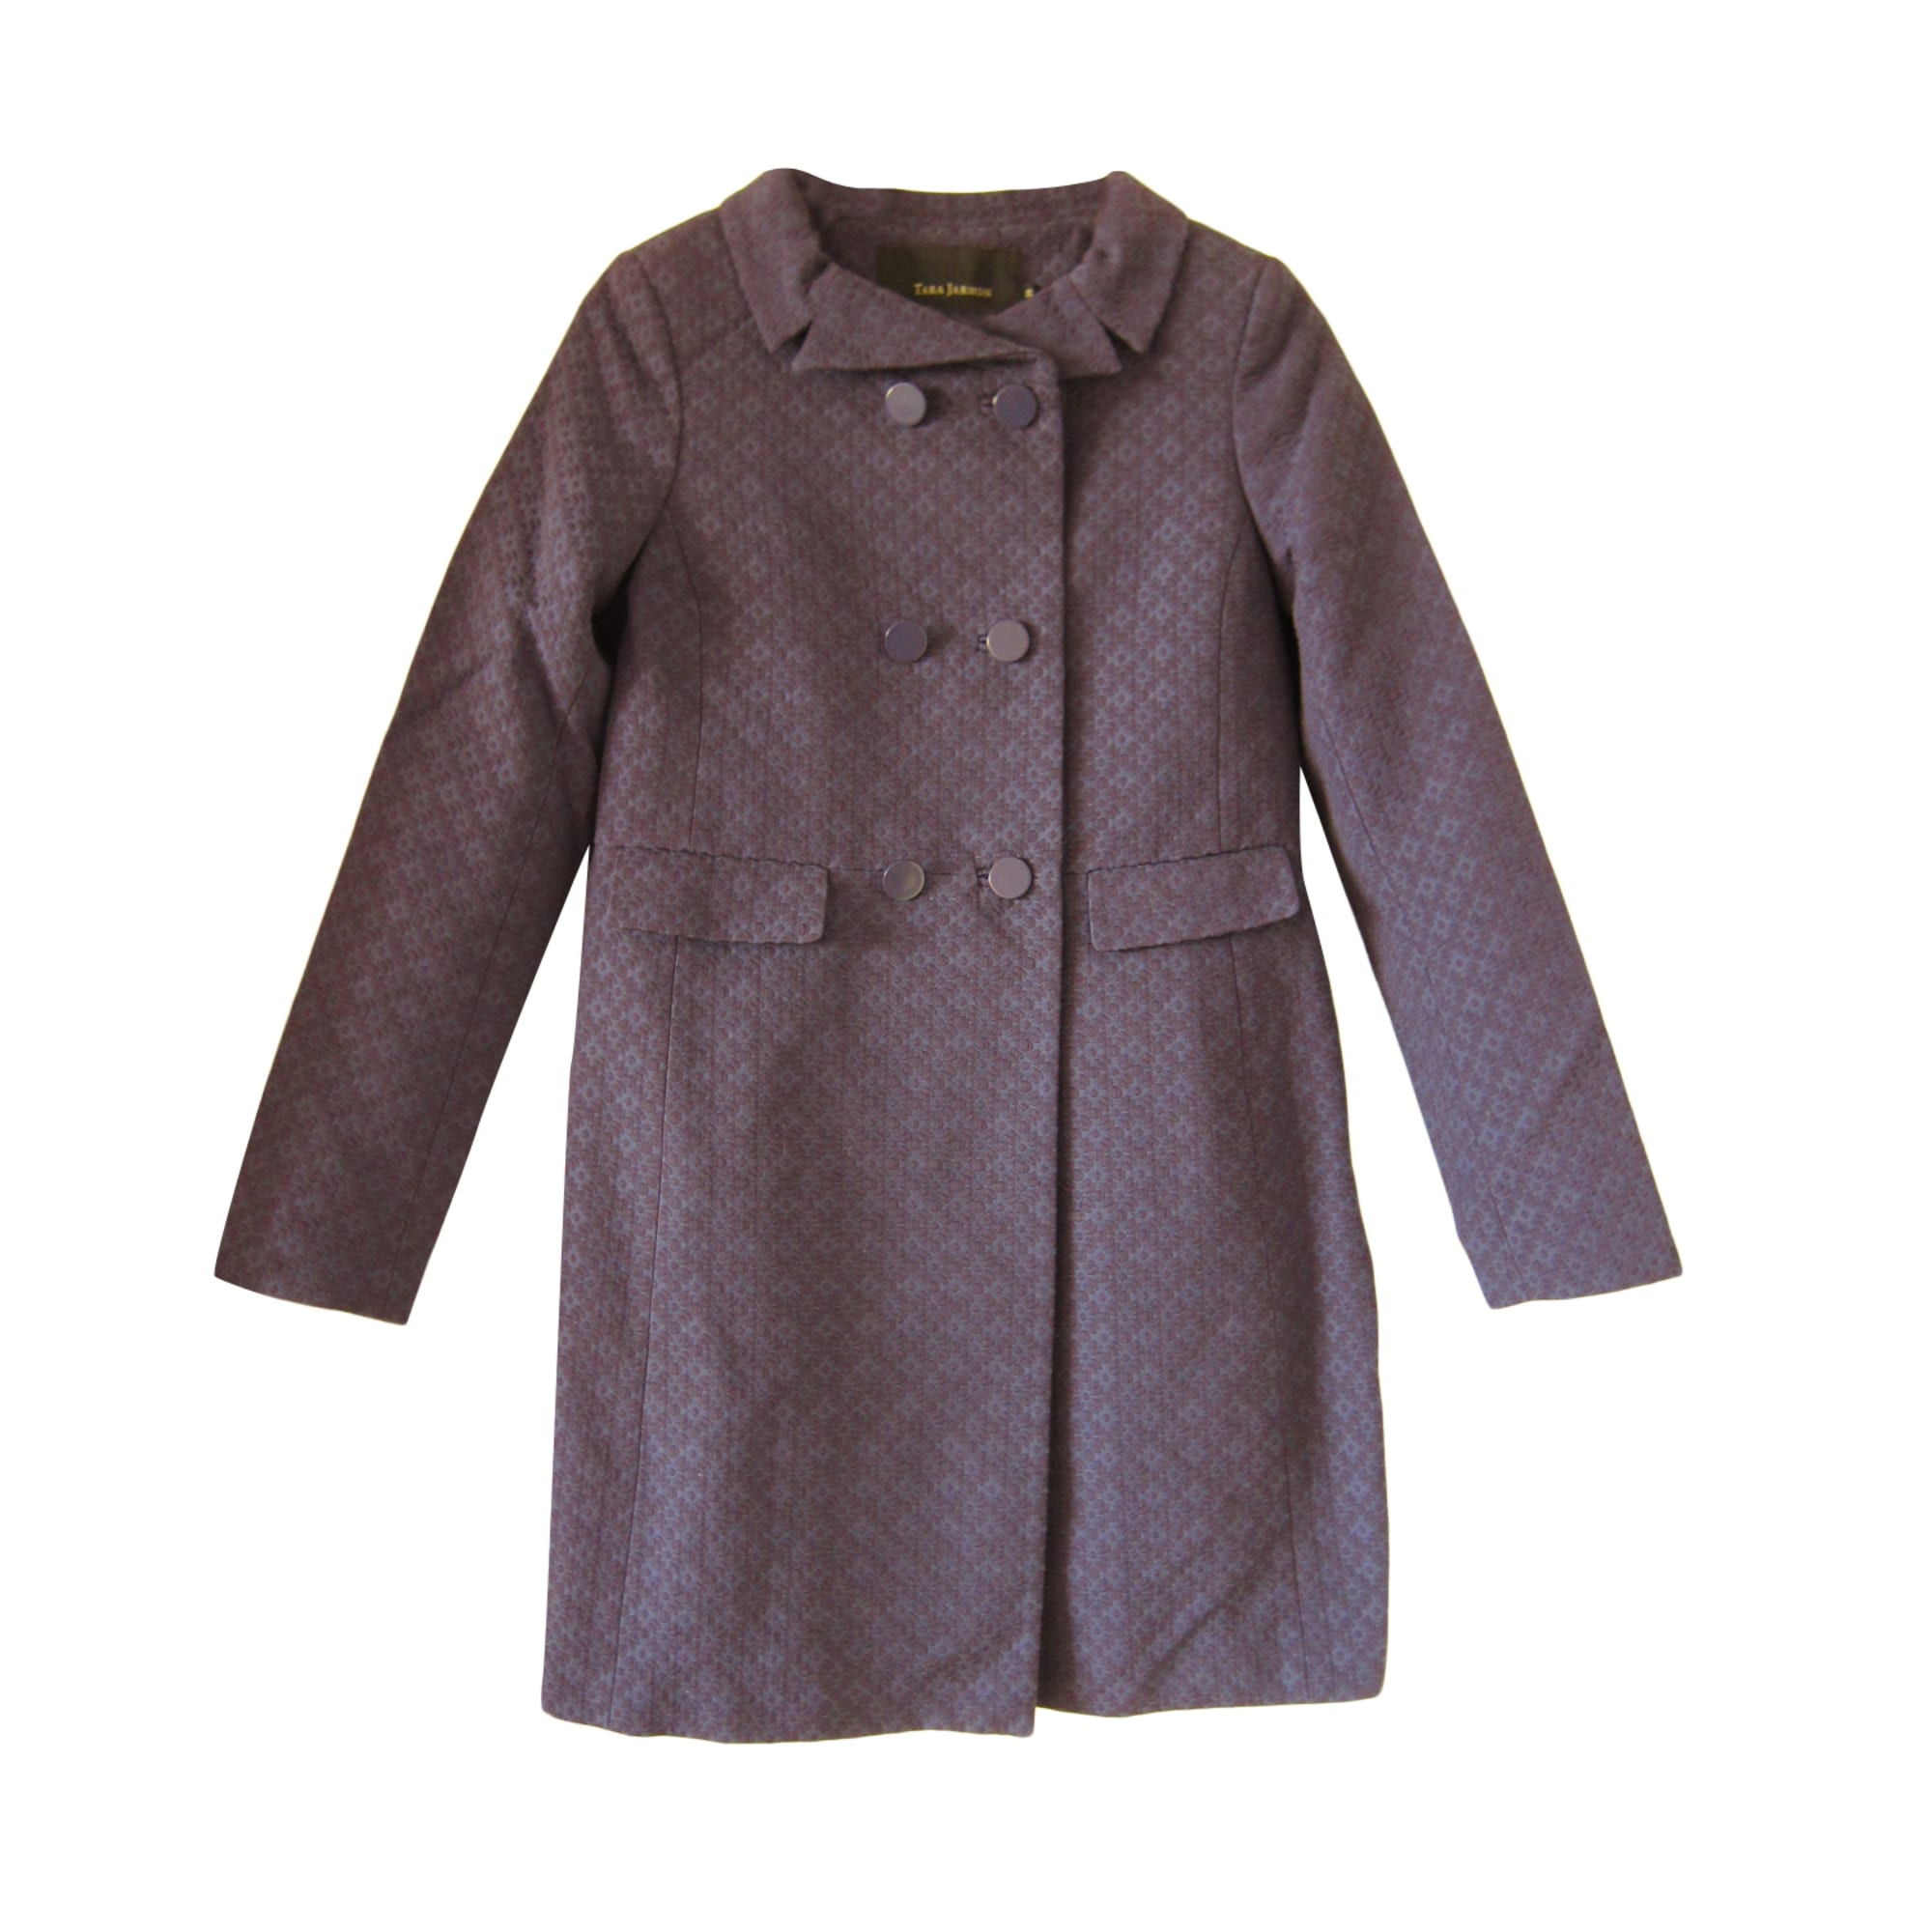 Manteau TARA JARMON Violet, mauve, lavande